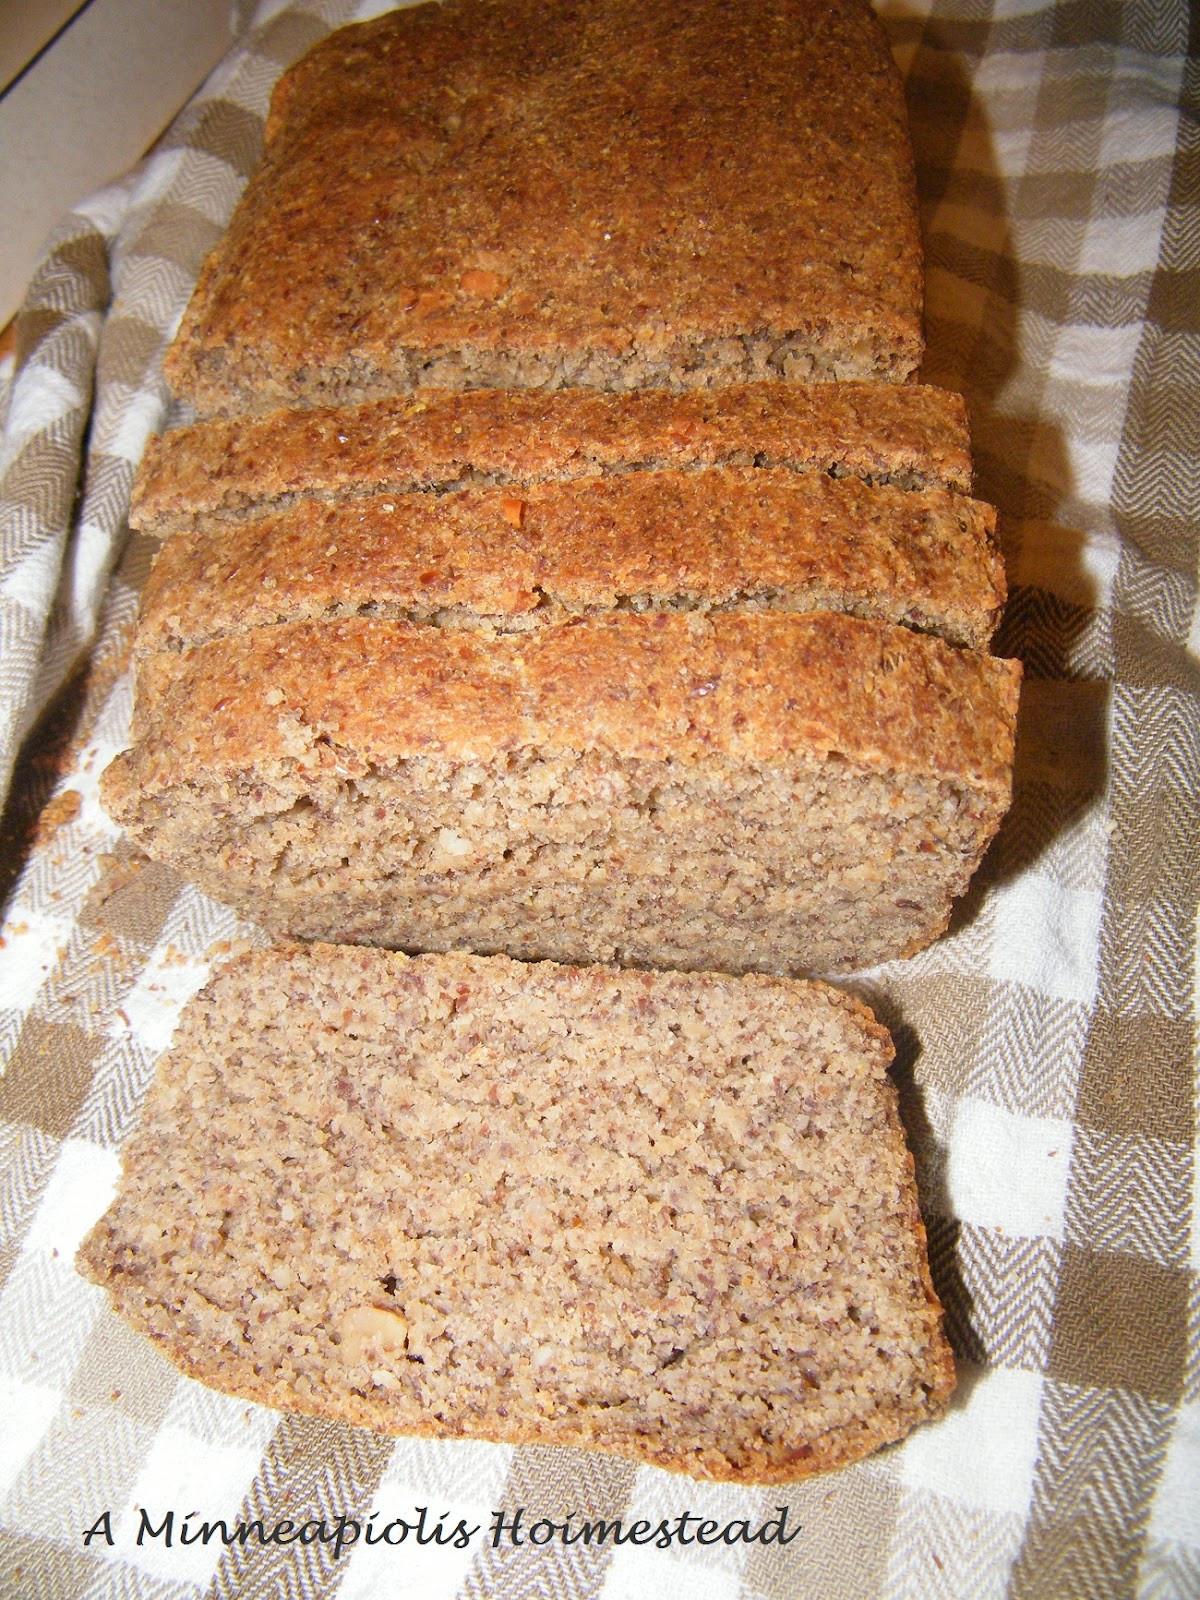 High Fiber Low Carb Bread  Healthy Fluffy High Fiber Yeast Bread Recipe recipe for